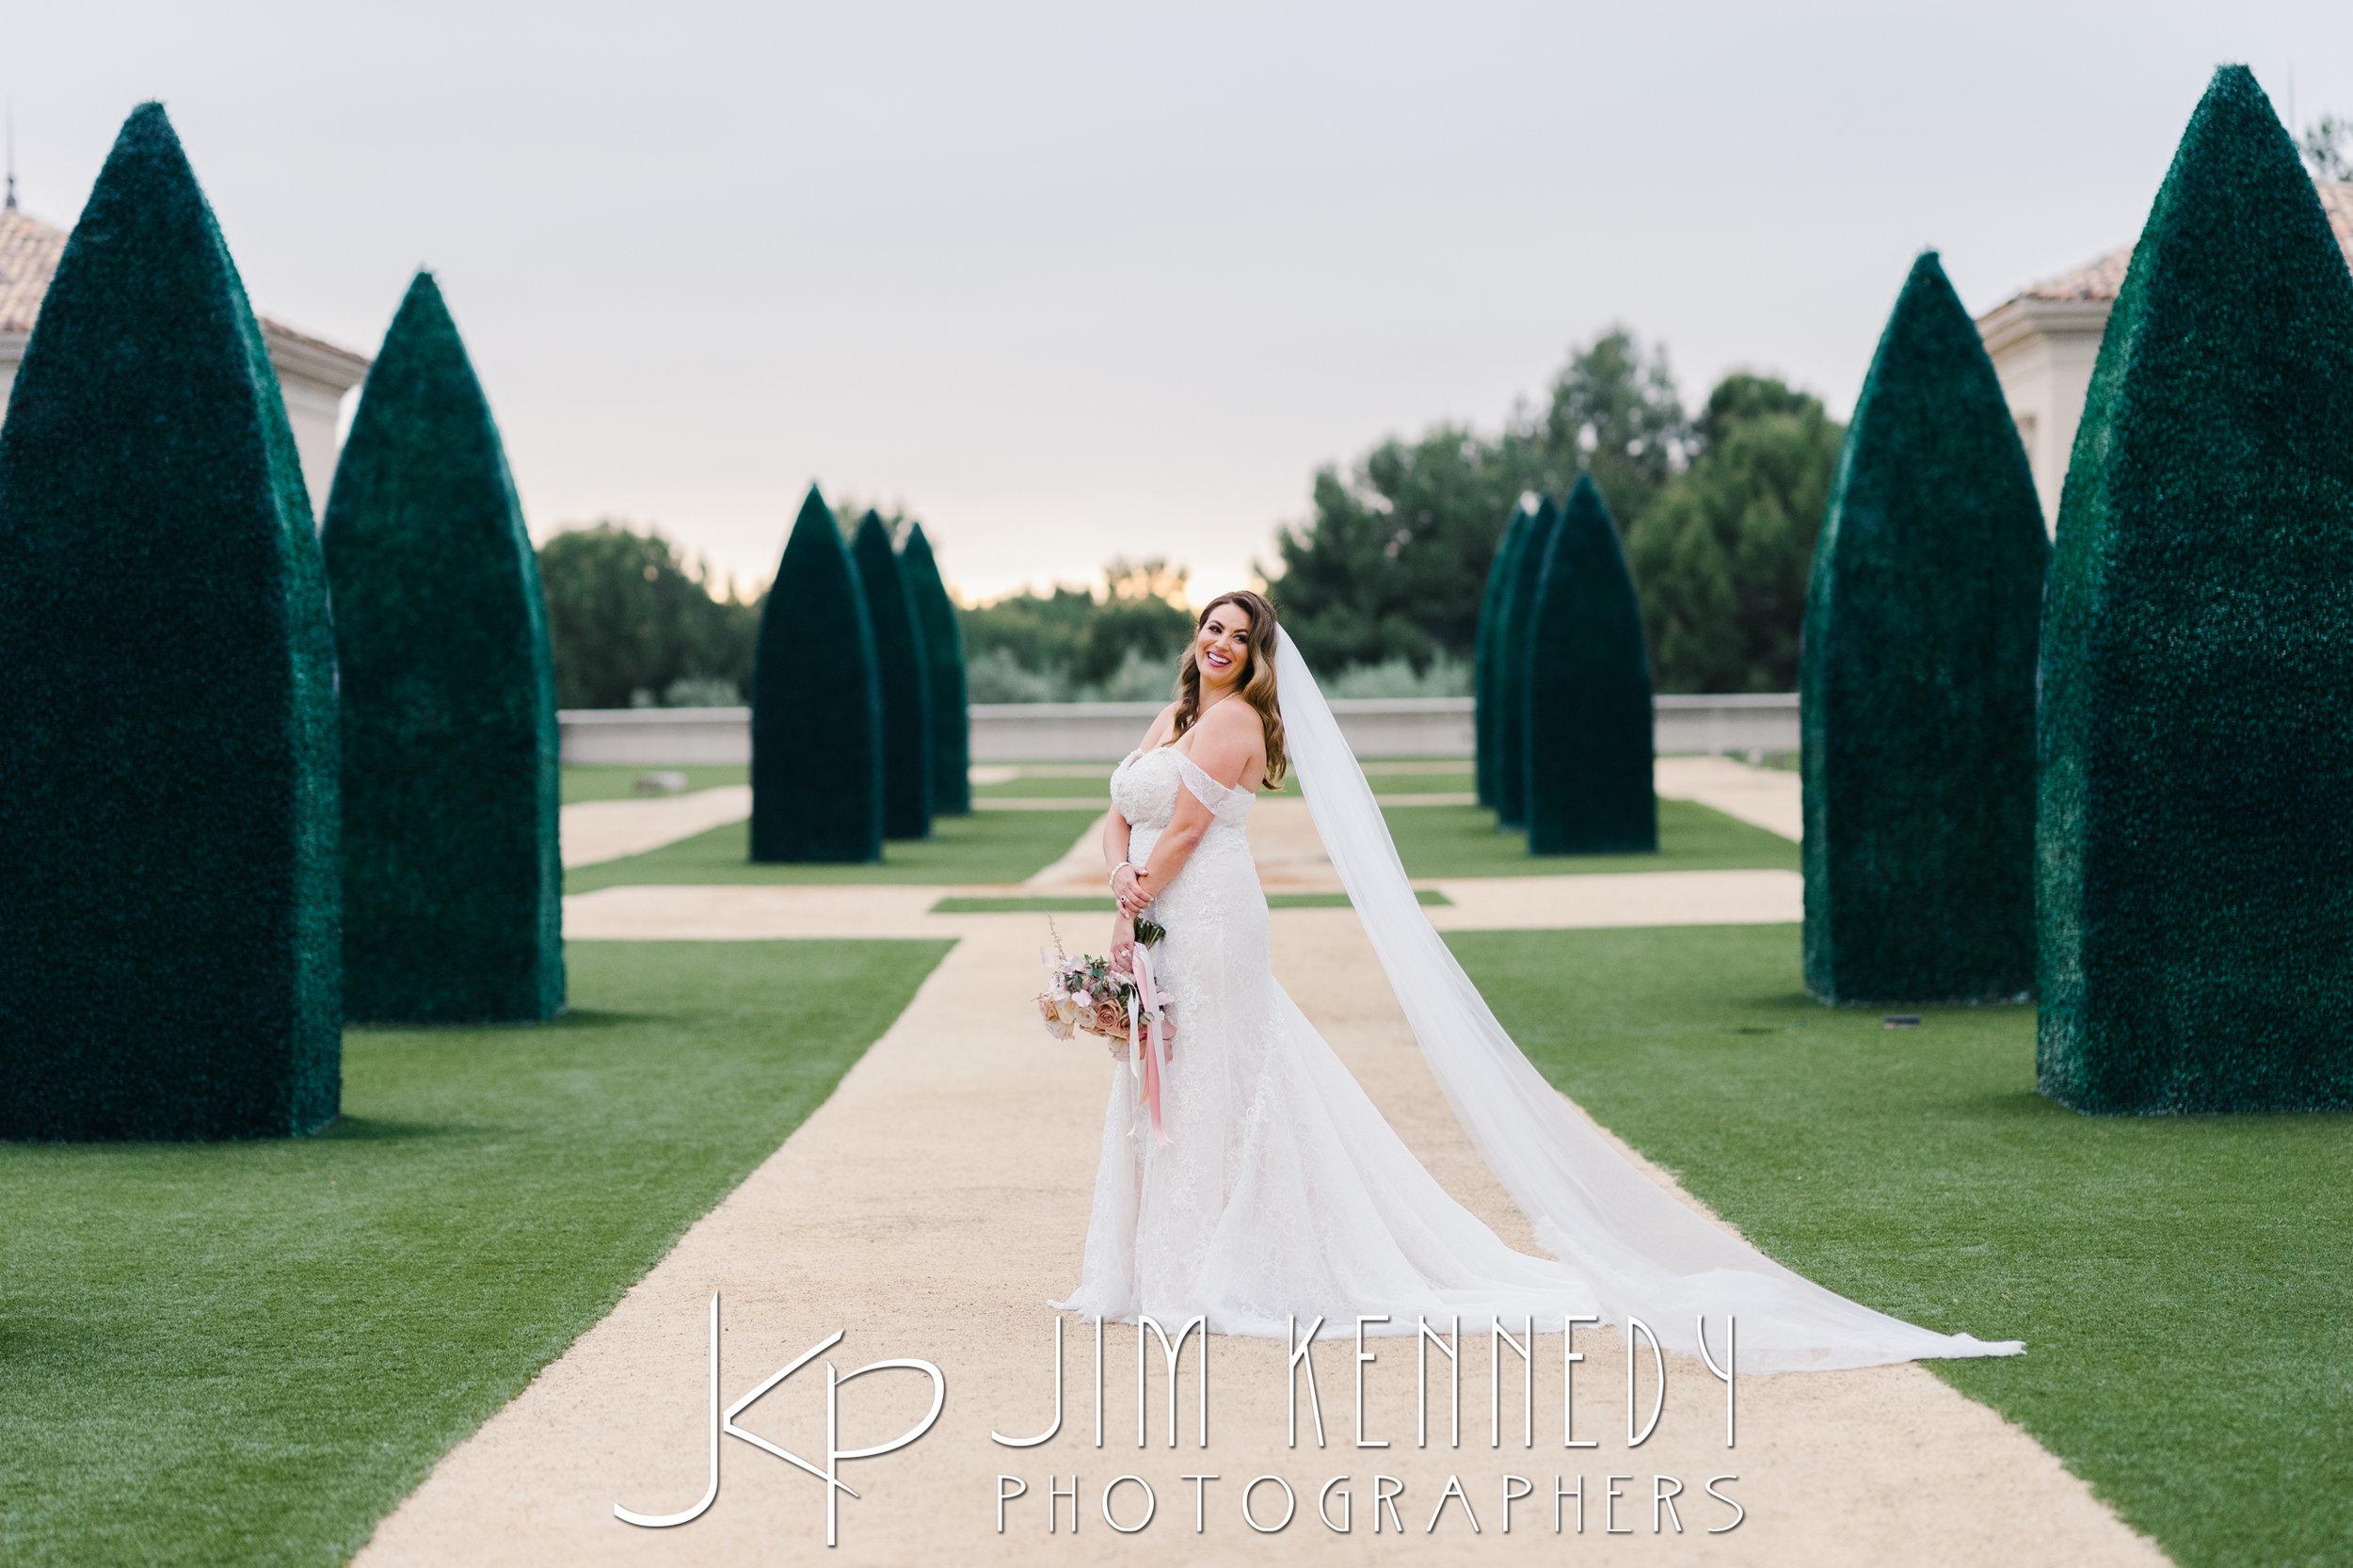 pelican-hill-wedding-jim-kenedy-photographers_0169.JPG